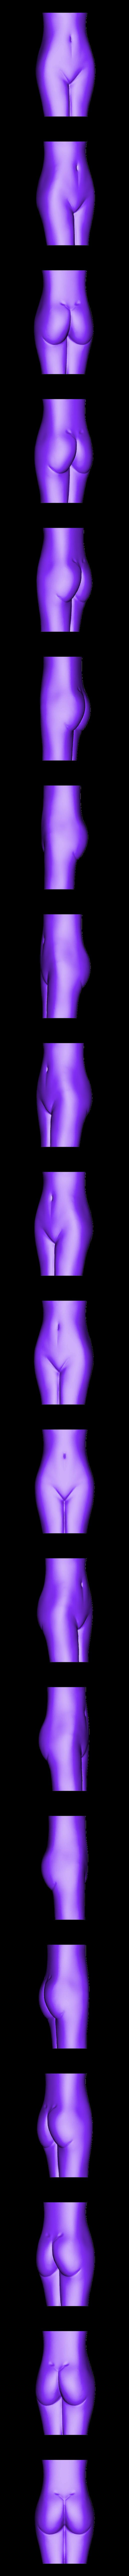 Female vase v1.0.obj Download free OBJ file Female vase • Design to 3D print, h3ydari96